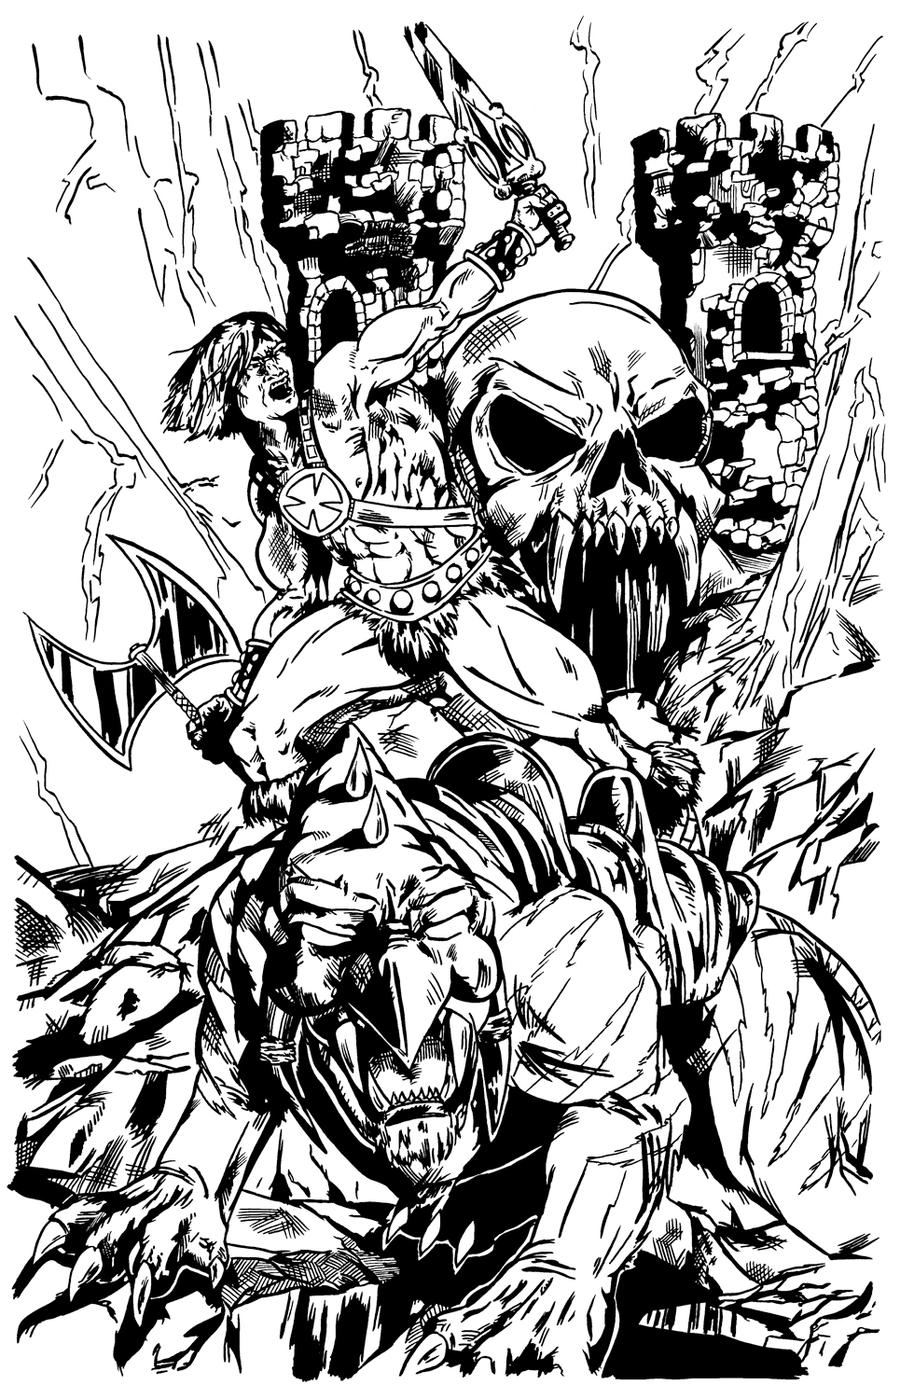 He Man inks by pycca on DeviantArt